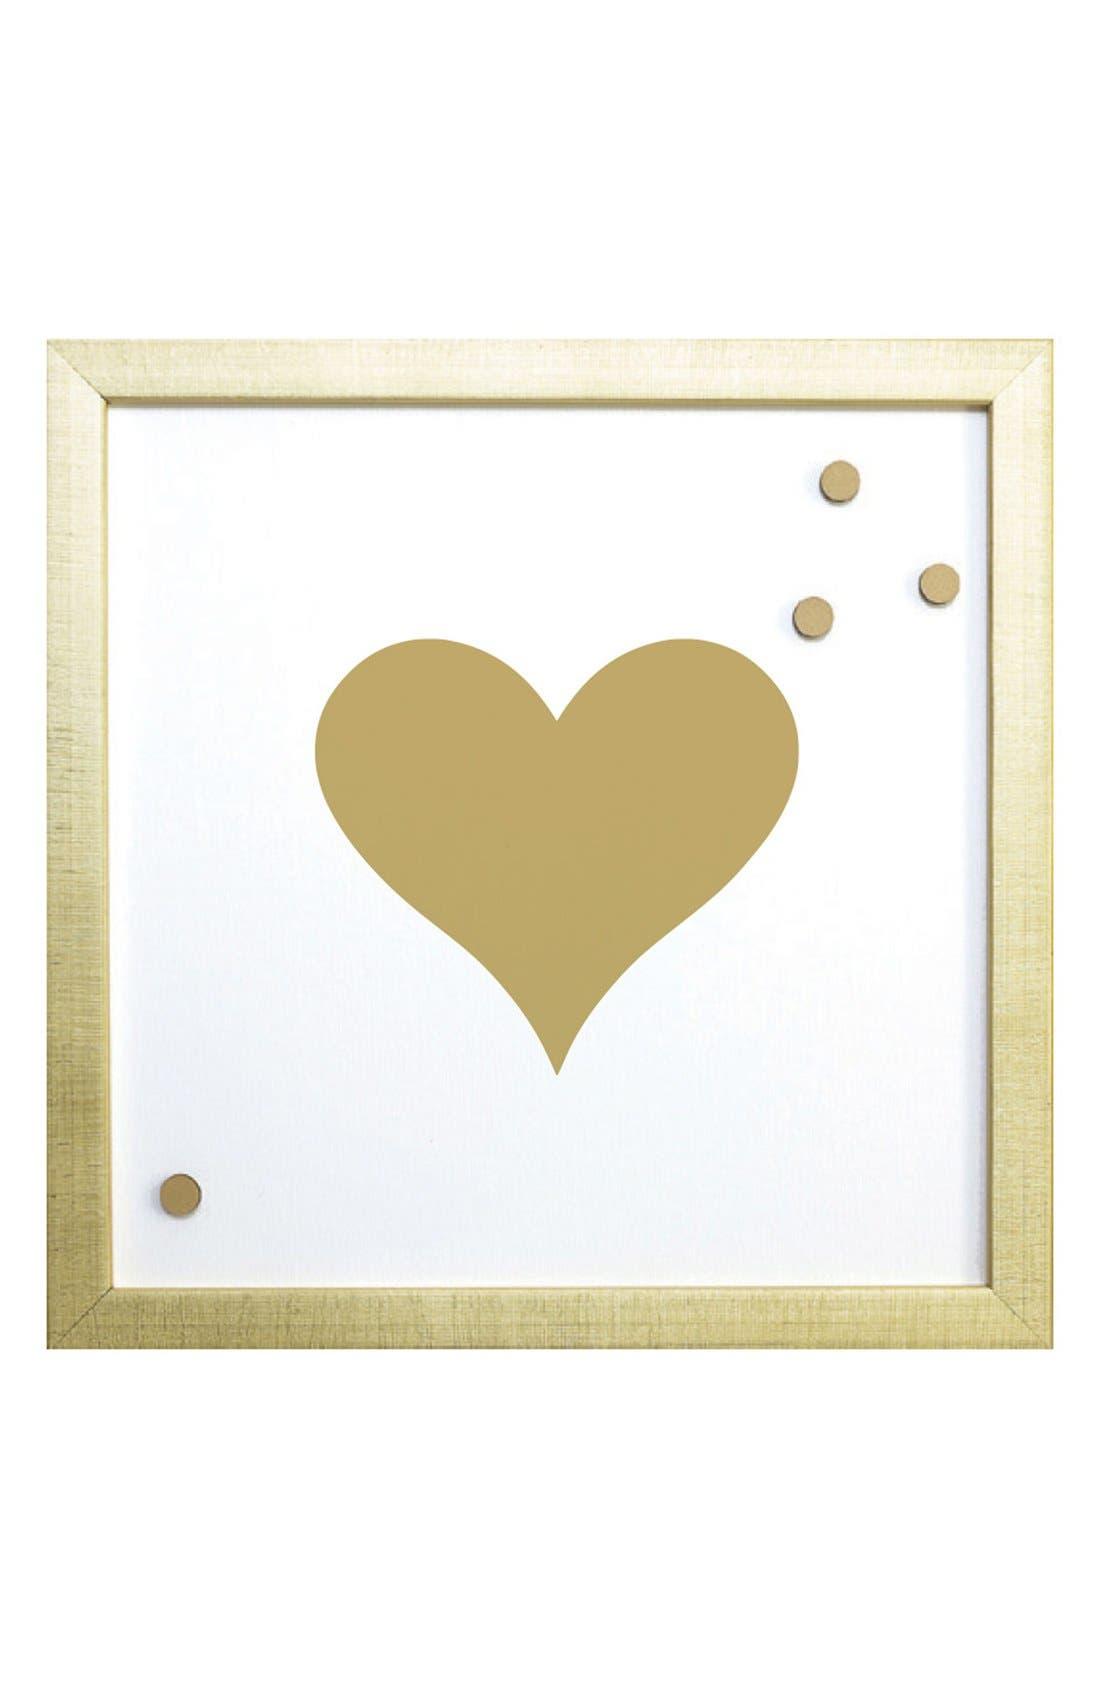 Main Image - Petal Lane 'Heart' Magnet Board